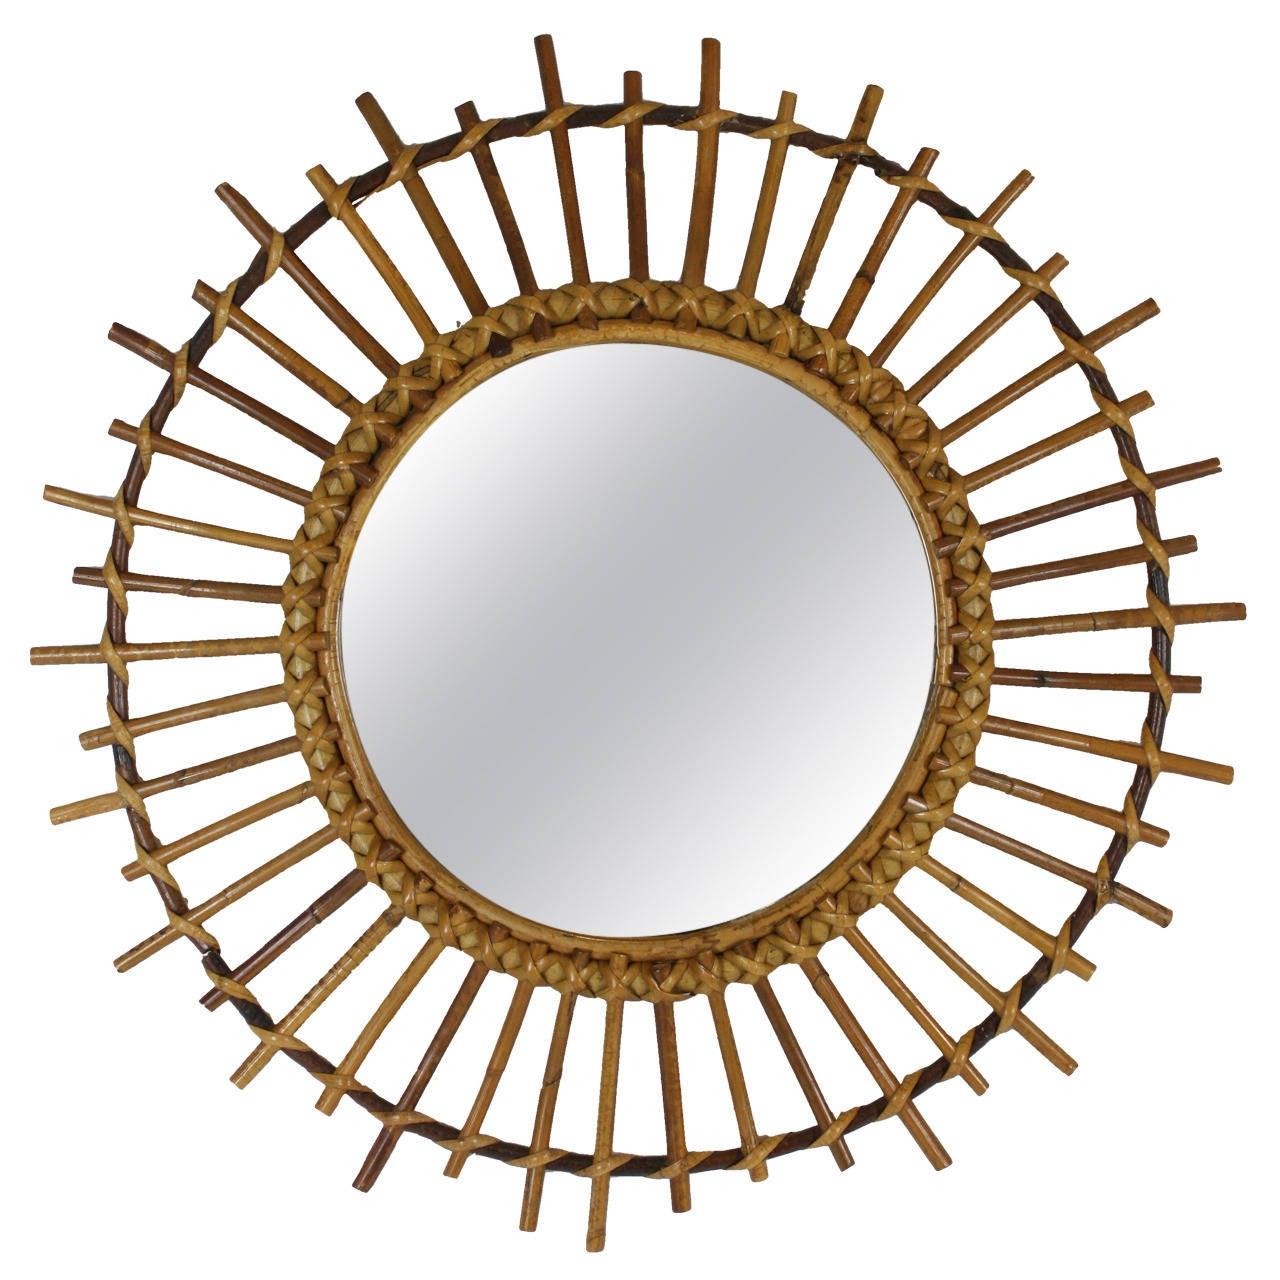 1960s spanish rattan sunburst mirror at 1stdibs for Sunburst mirror